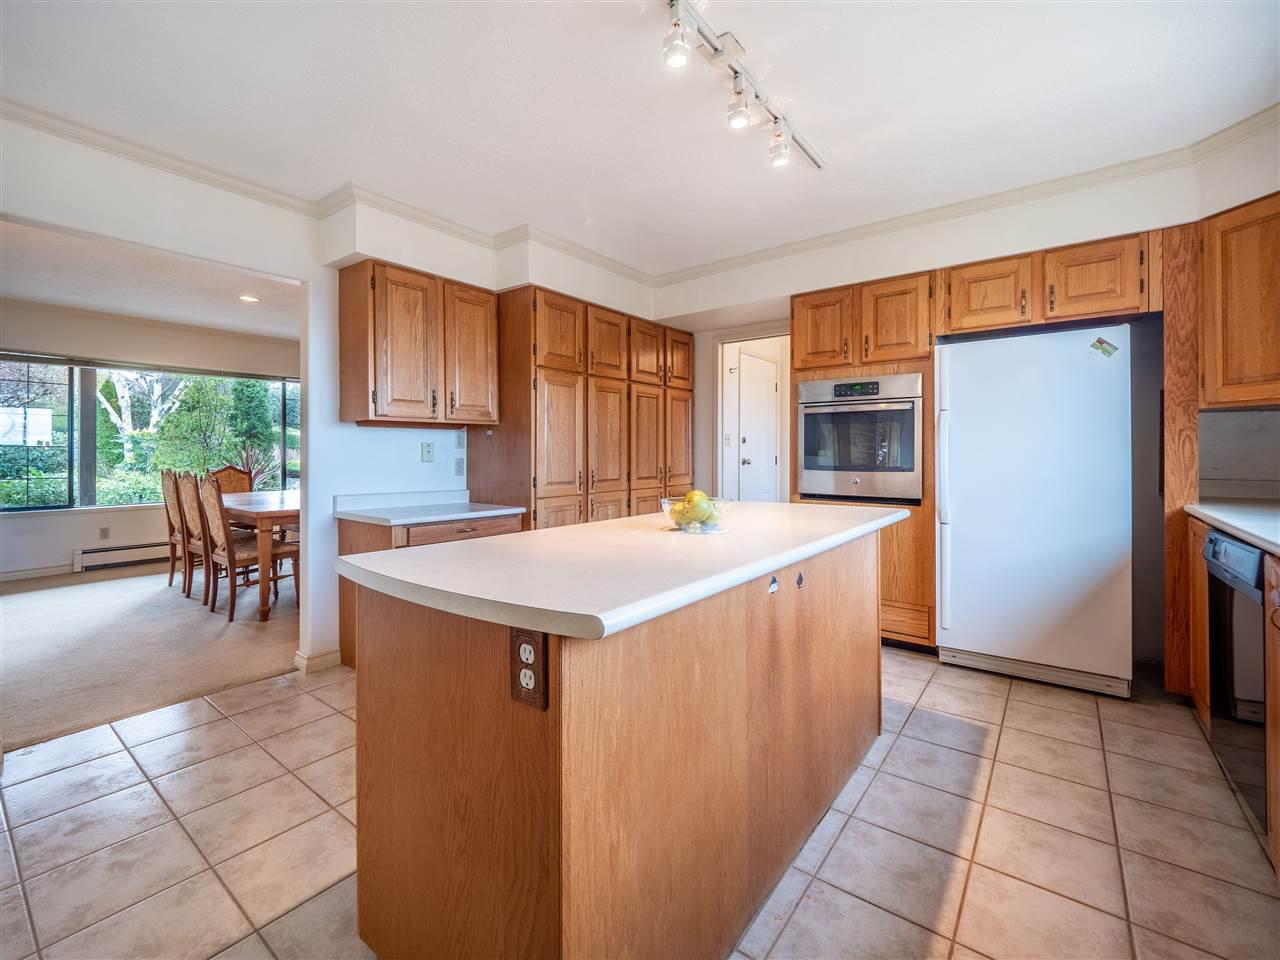 Photo 5: Photos: 5107 RADCLIFFE Road in Sechelt: Sechelt District House for sale (Sunshine Coast)  : MLS®# R2425277